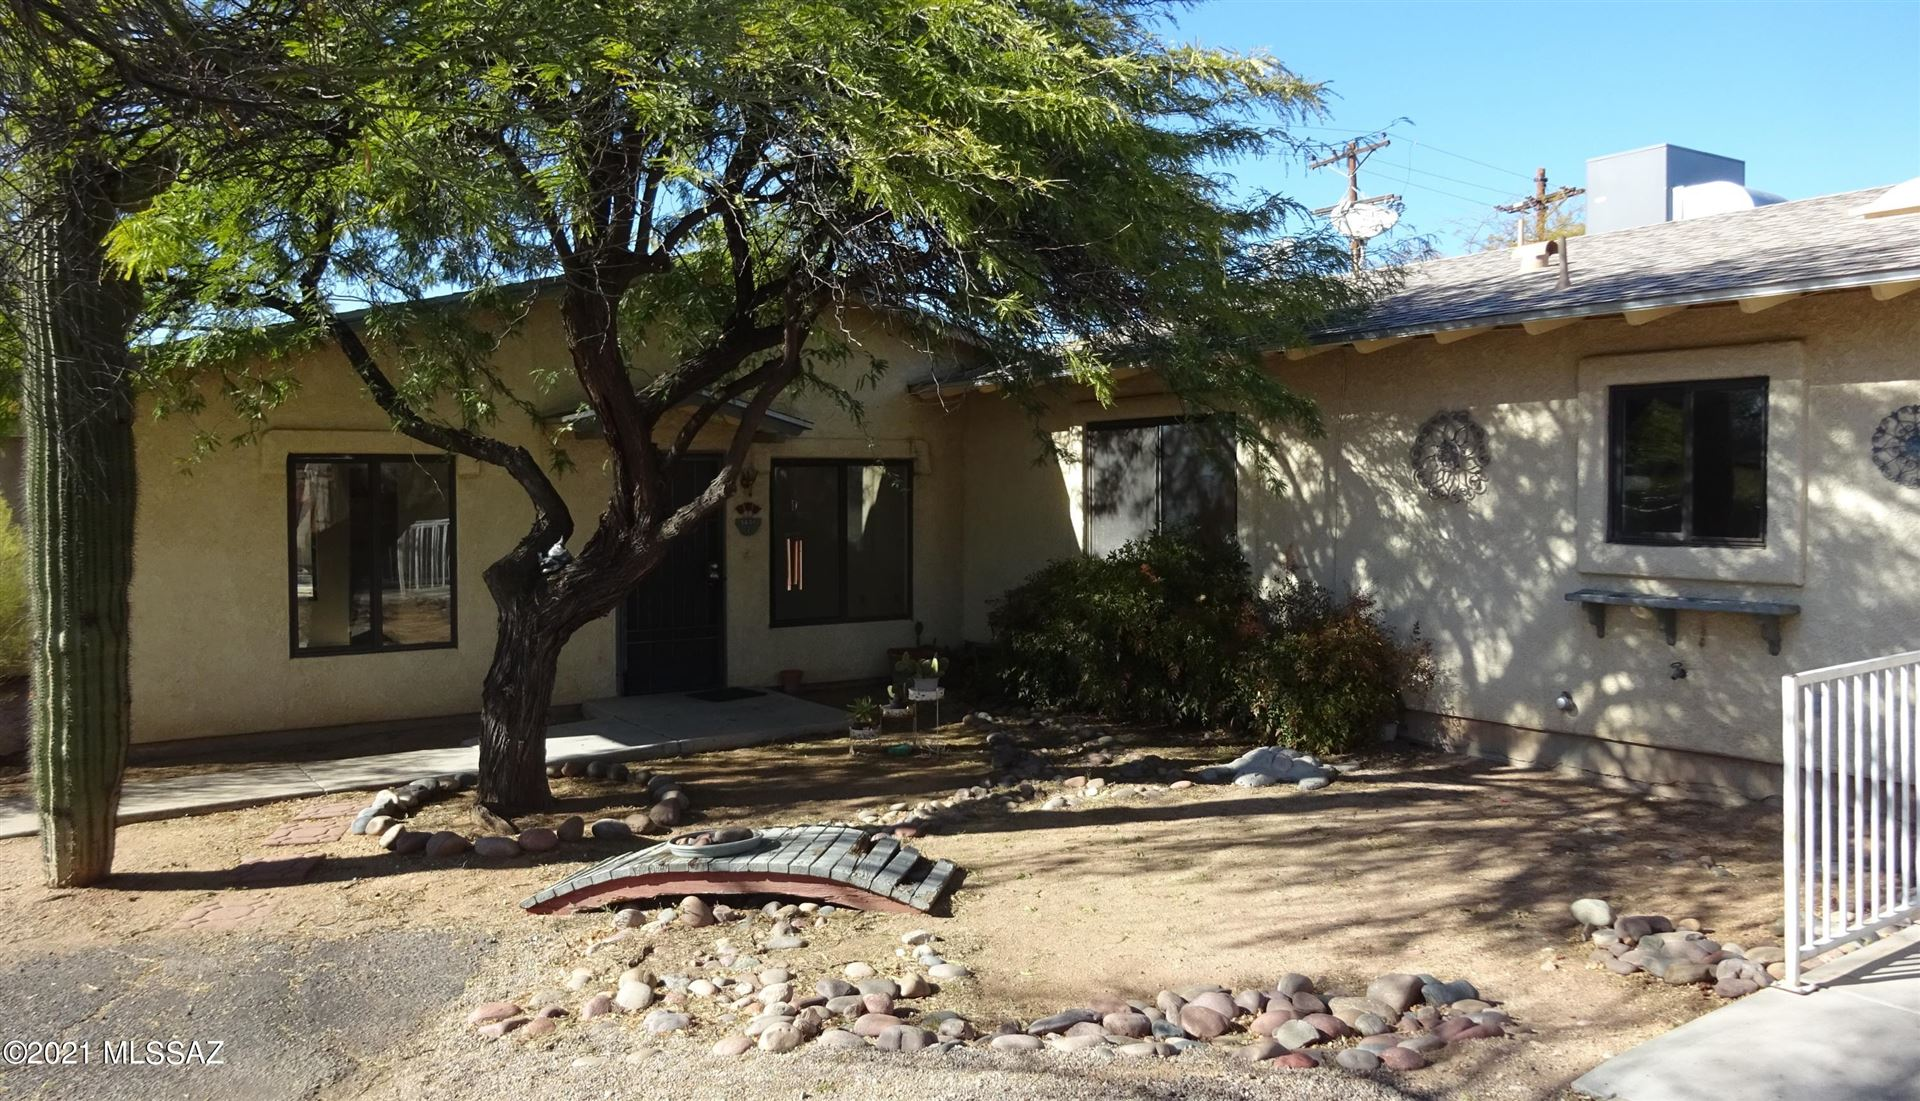 5601 E 10th Street, Tucson, AZ 85711 - MLS#: 22109201